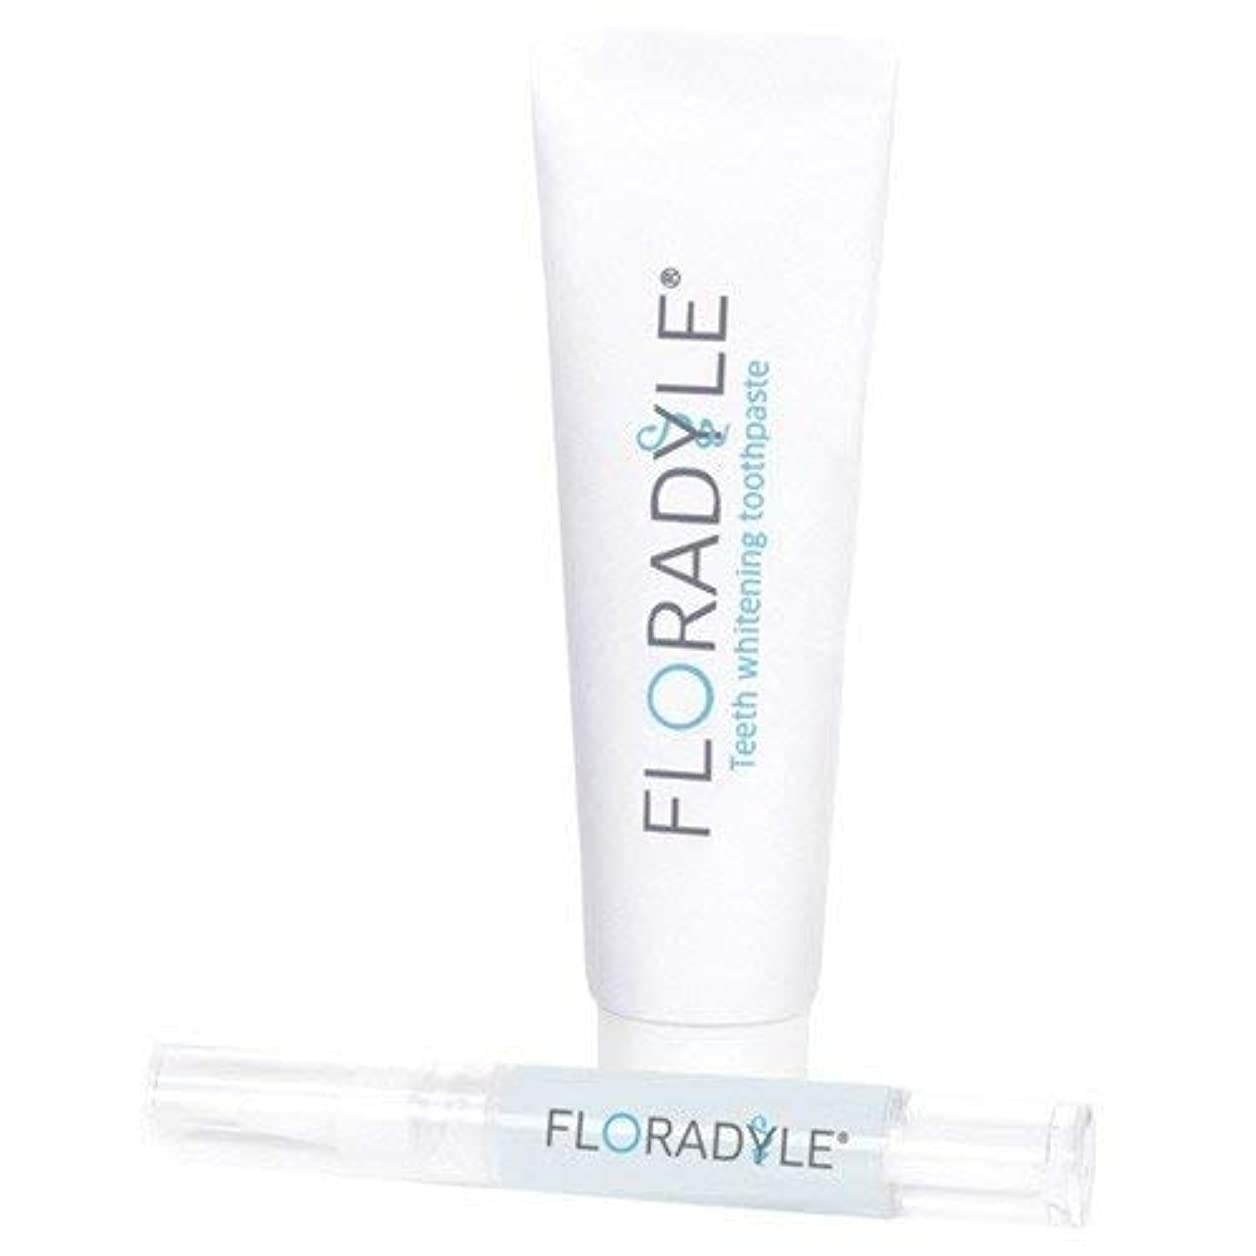 Floradyle(フロラダイル) ホワイトニングジェル&ホワイトニング歯磨き粉 セット